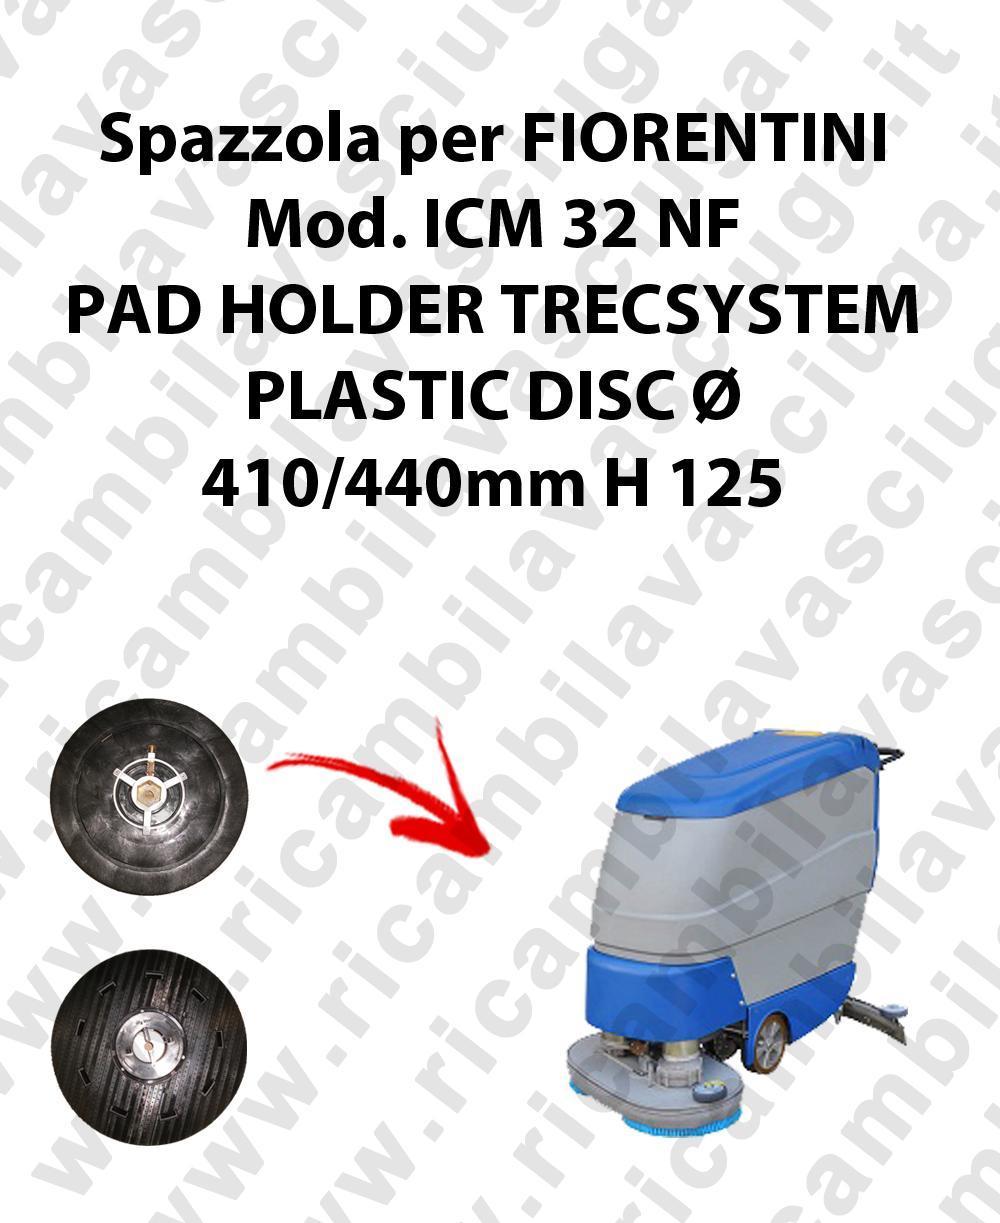 PAD HOLDER TRECSYSTEM  pour autolaveuses FIORENTINI Reference ICM 32 NF